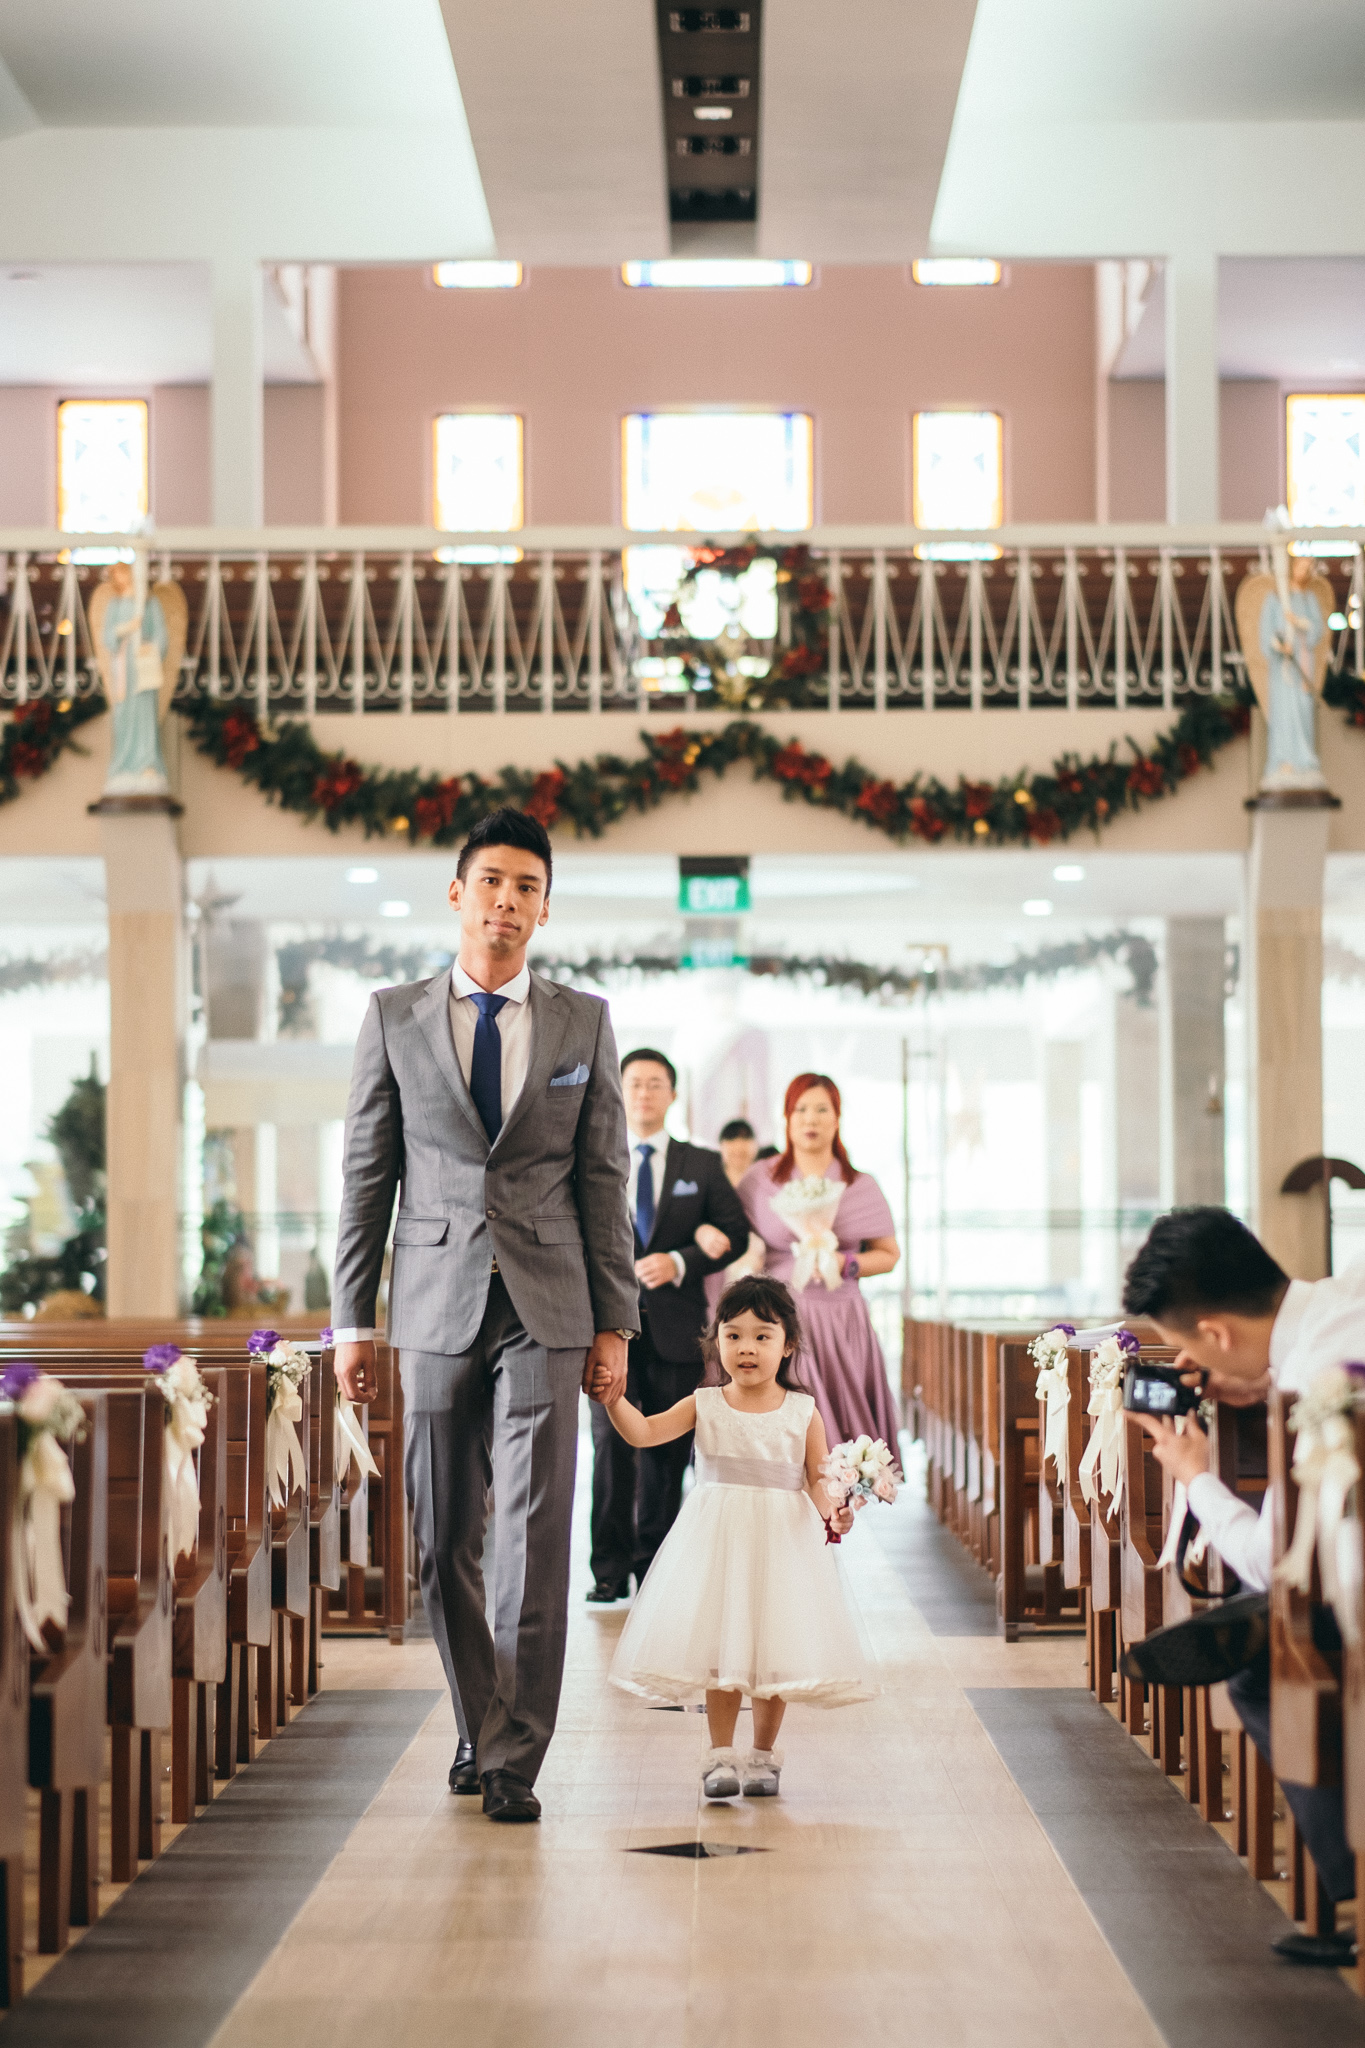 Juxtapose Pix - Wedding - Kelvin & Serene - church regent hotel 00023.jpg